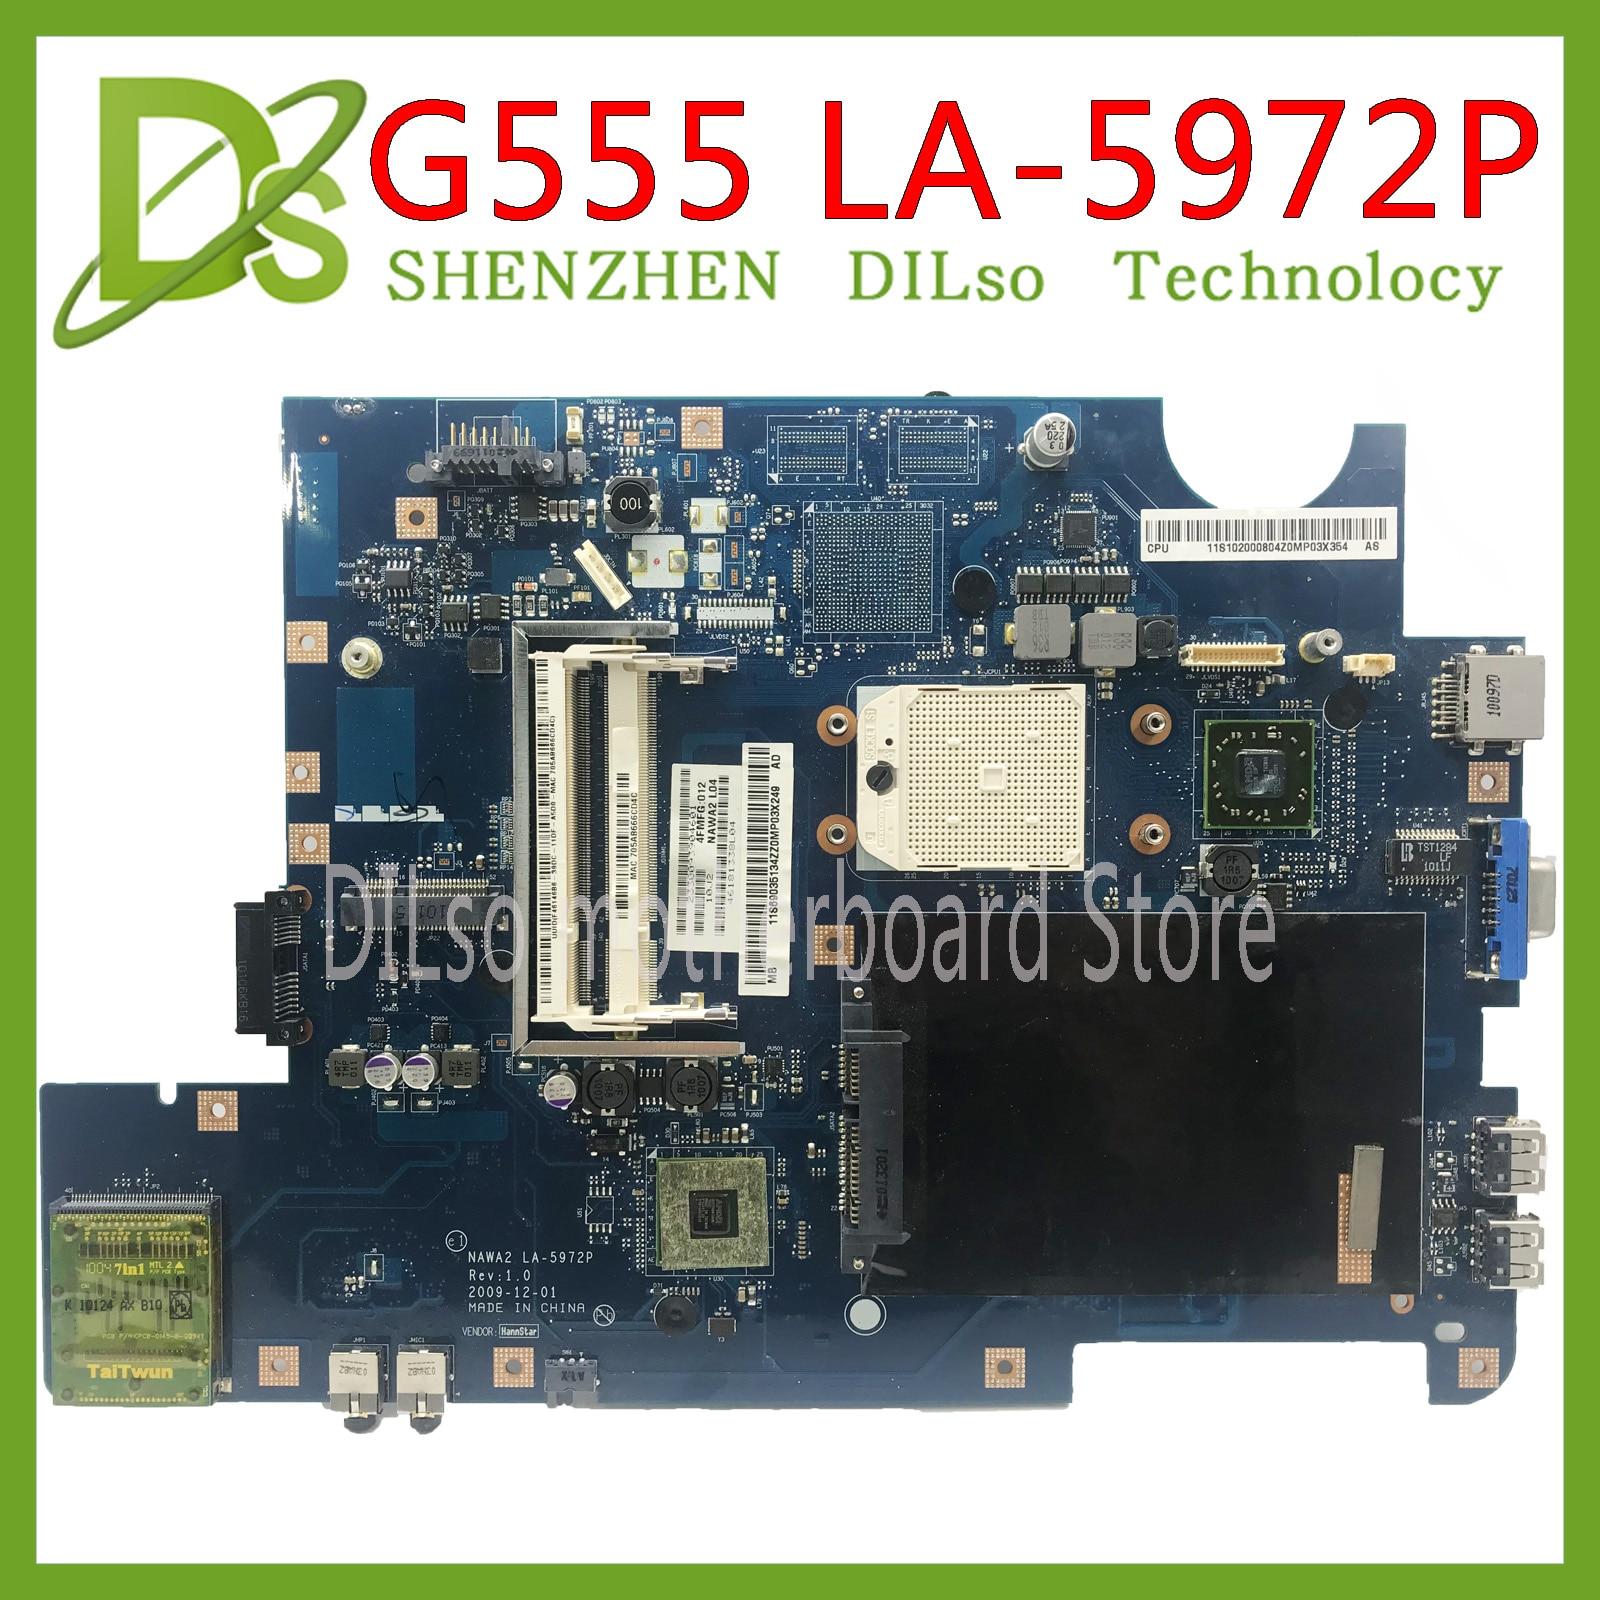 KEFU Laptop Motherboard Mainboard Notebook G555 LA-5972P Original DDR2 for Lenovo NAWA2